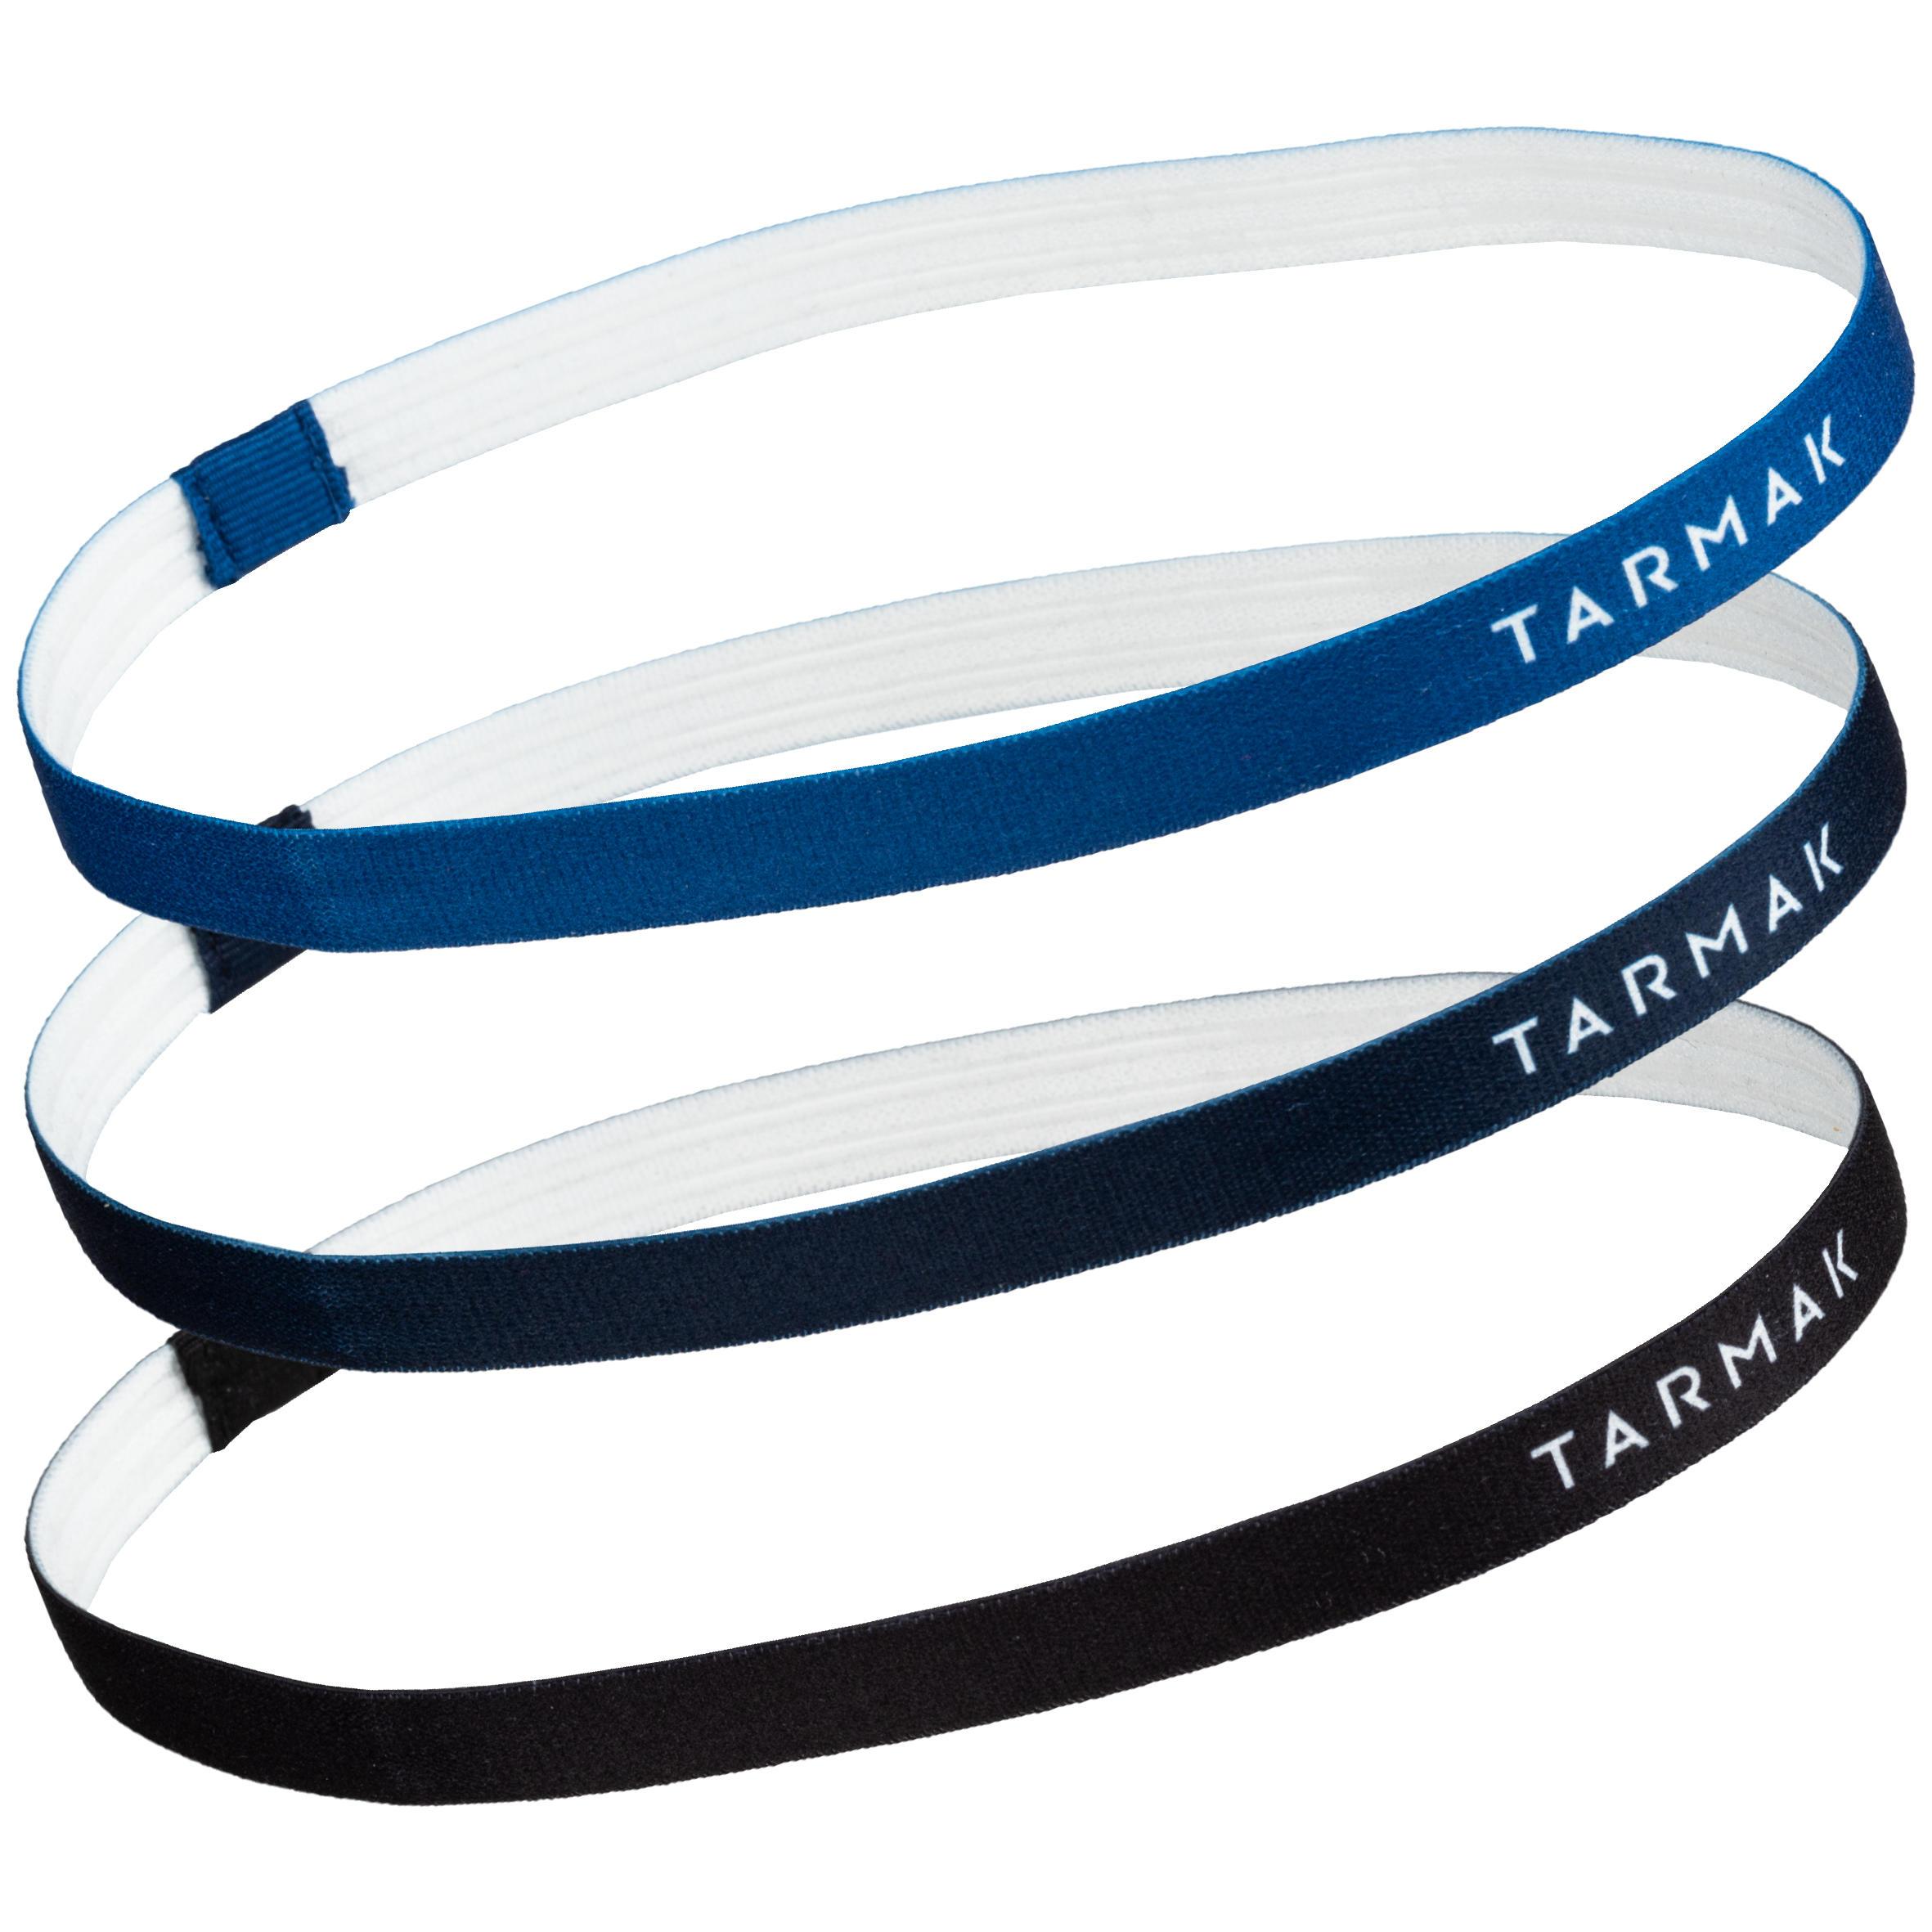 Set Bentițe elastice Baschet imagine